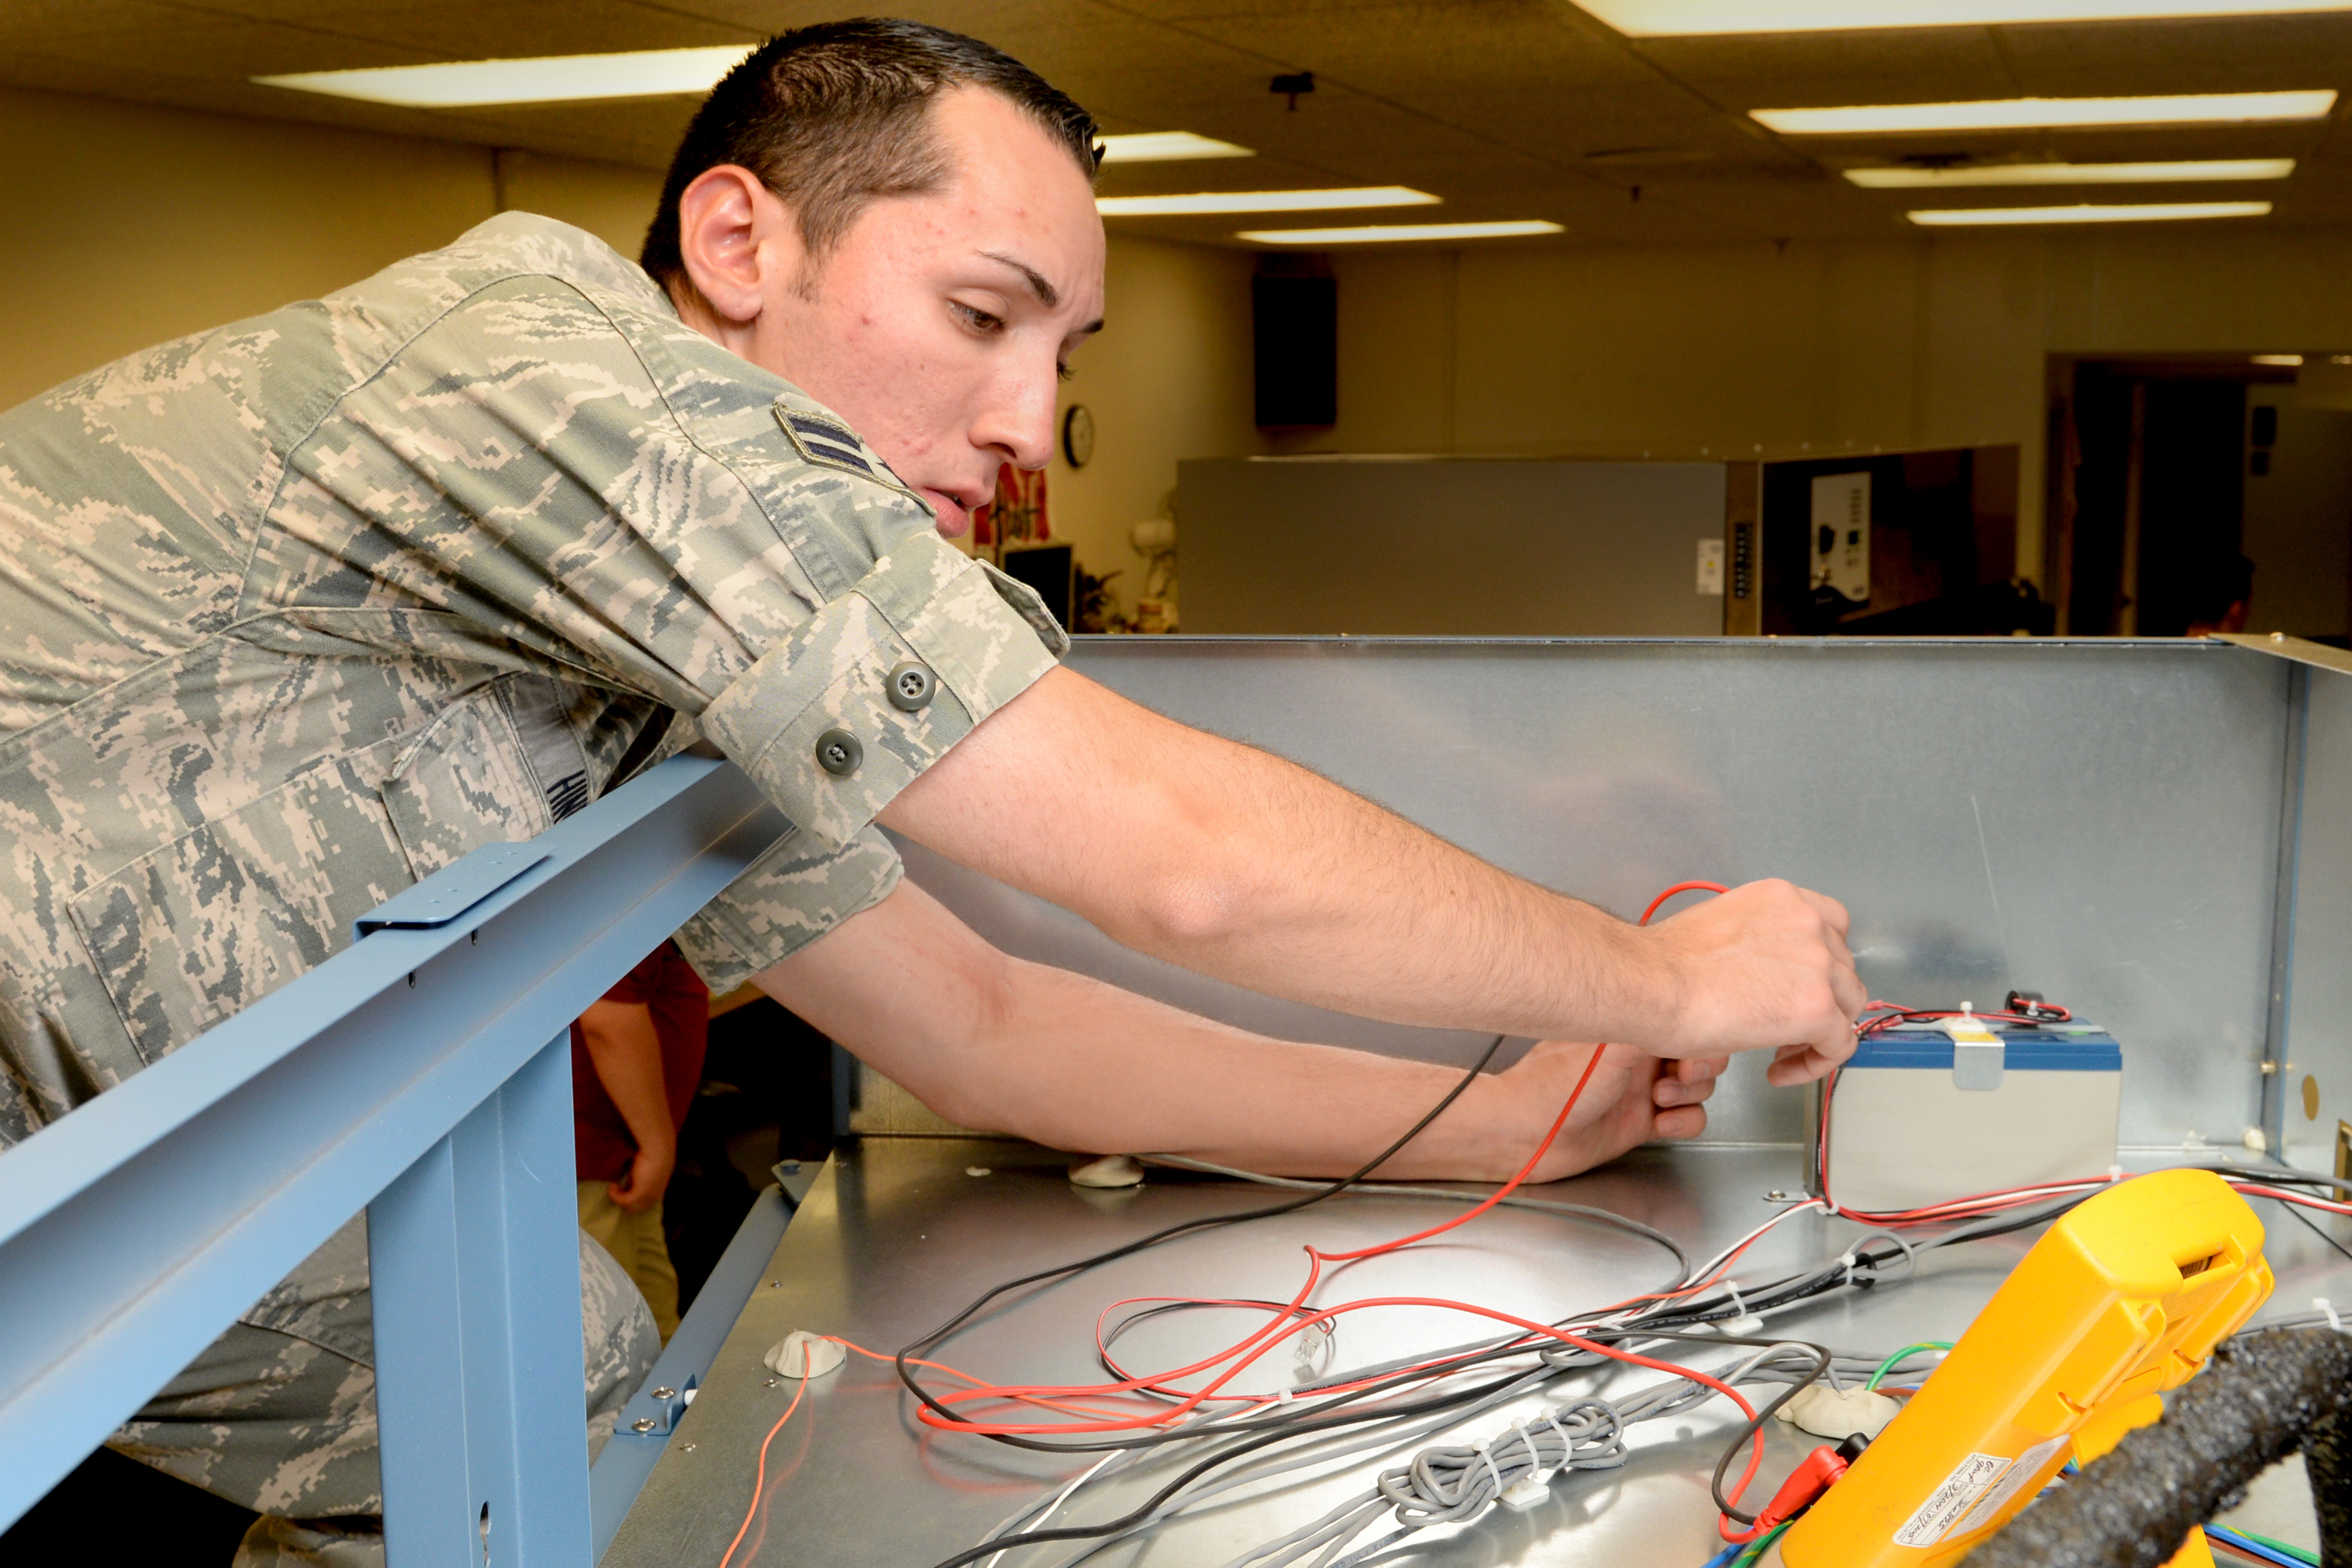 Medical equipment repair shop keeps mission going > Scott